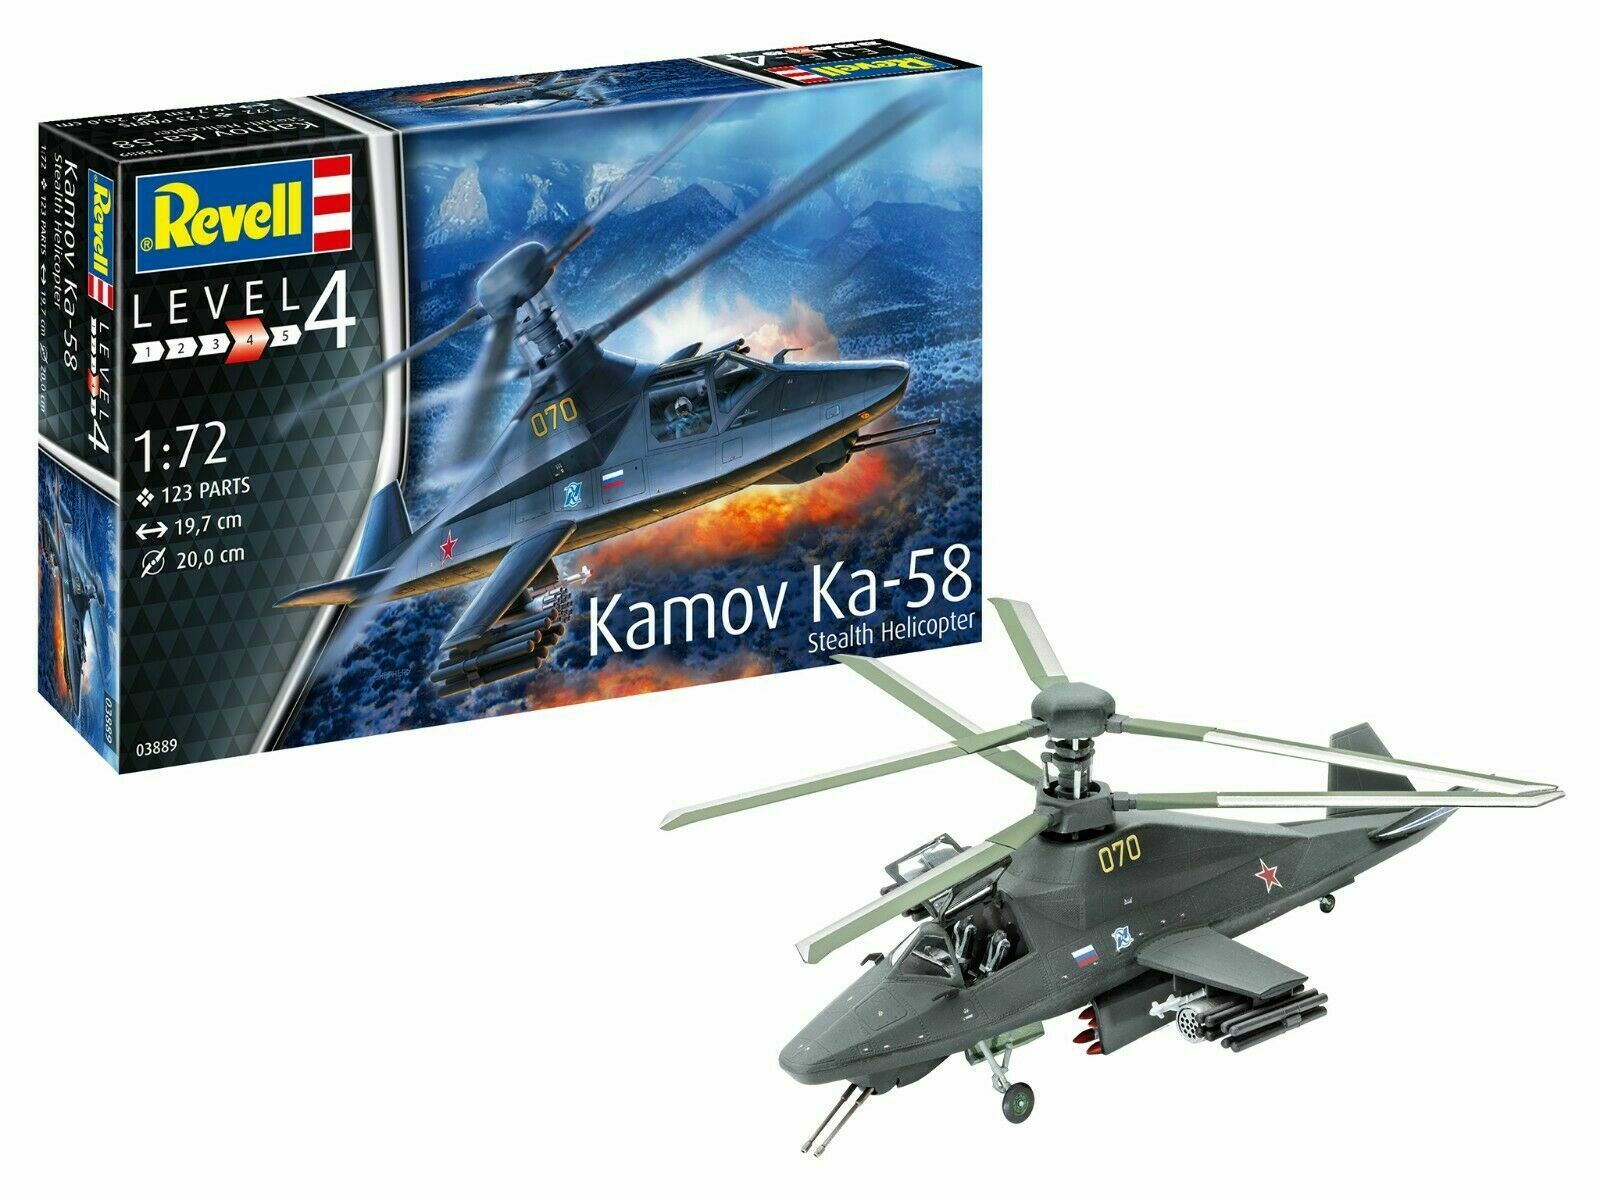 Revell 03889 Helikopter Kamov Ka -58 Stealth Helikopter Kit 1 72 Ny